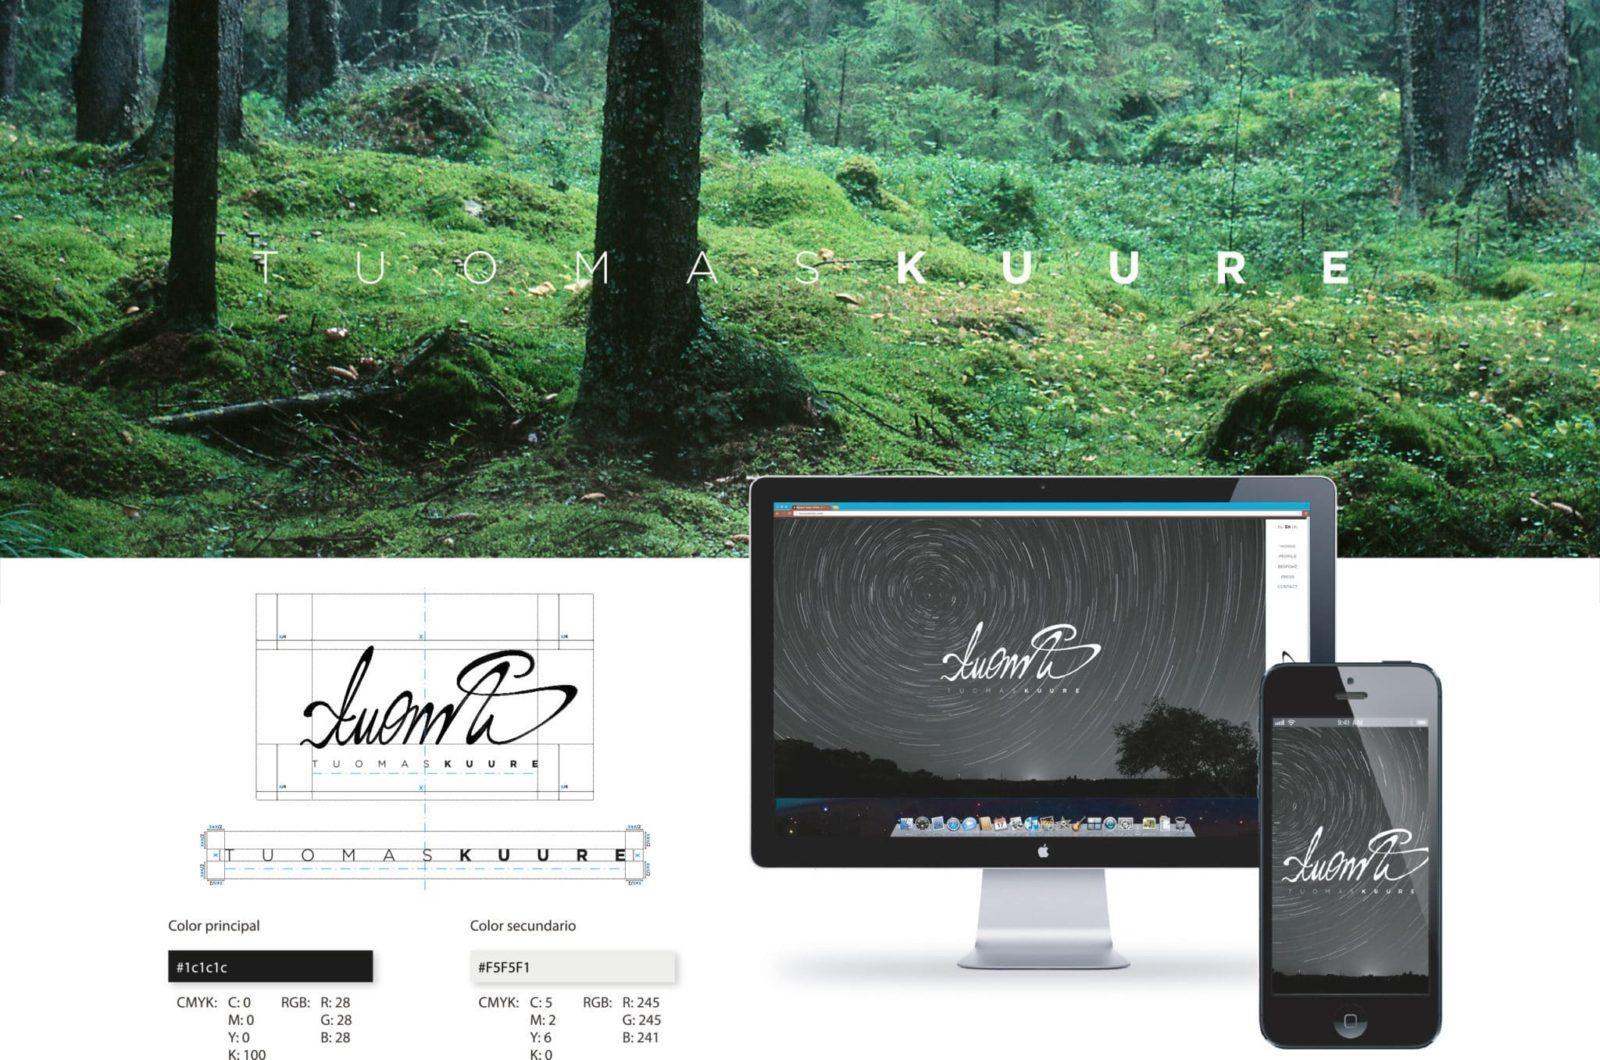 Sirope-tuomas-kuure-estudio-agencia-creativa-branding